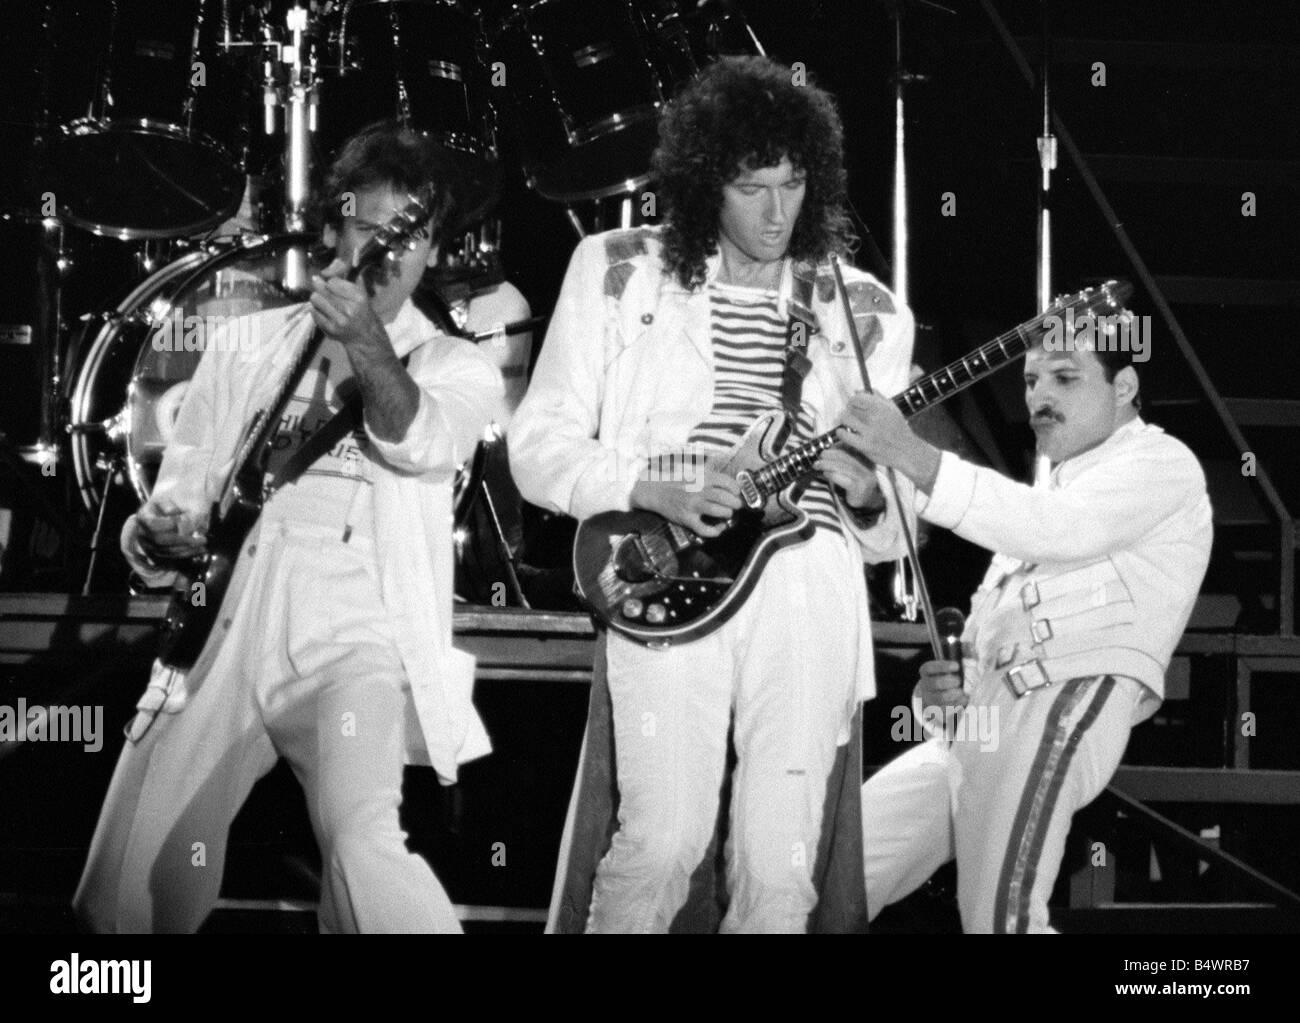 Queen and Freddie Mercury  - Page 2 Queen-rock-group-freddie-mercury-brian-may-john-deacon-roger-taylor-B4WRB7